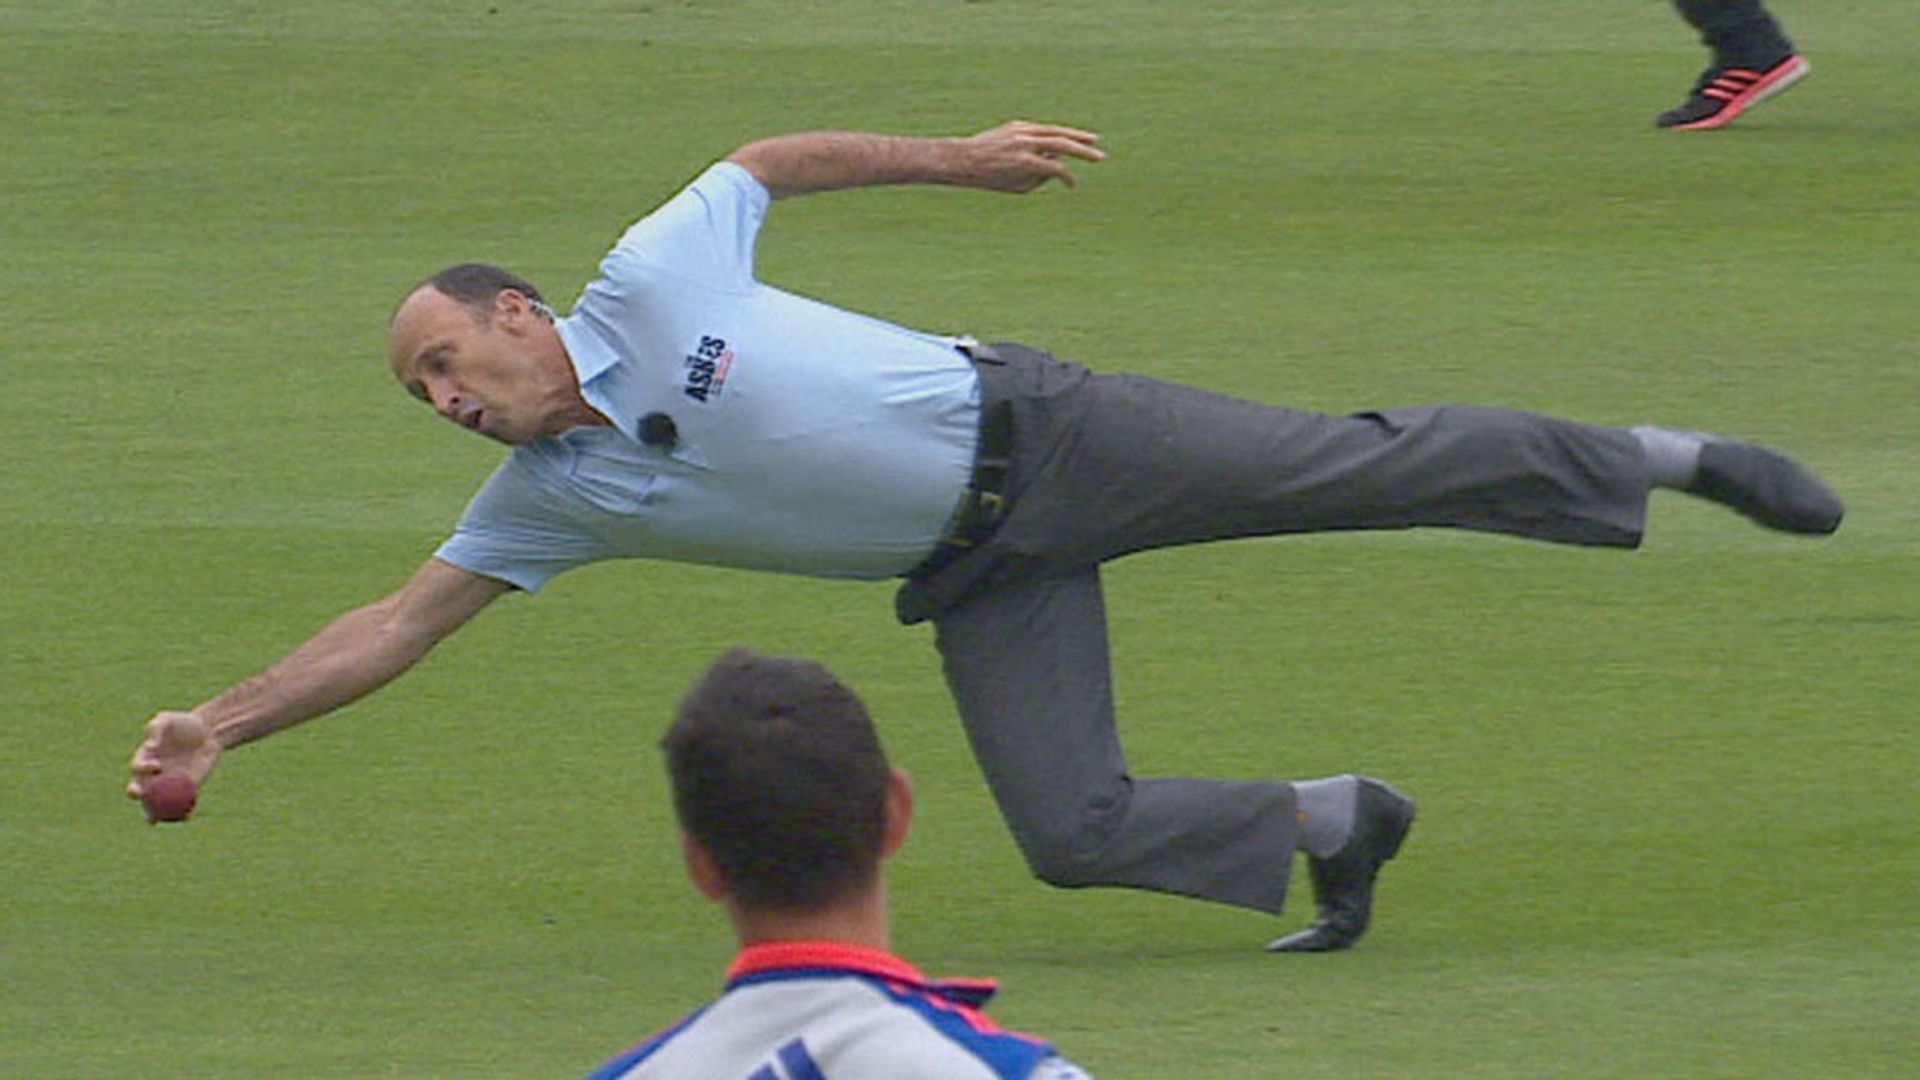 Nasser almost replicates Stokes wonder catch!